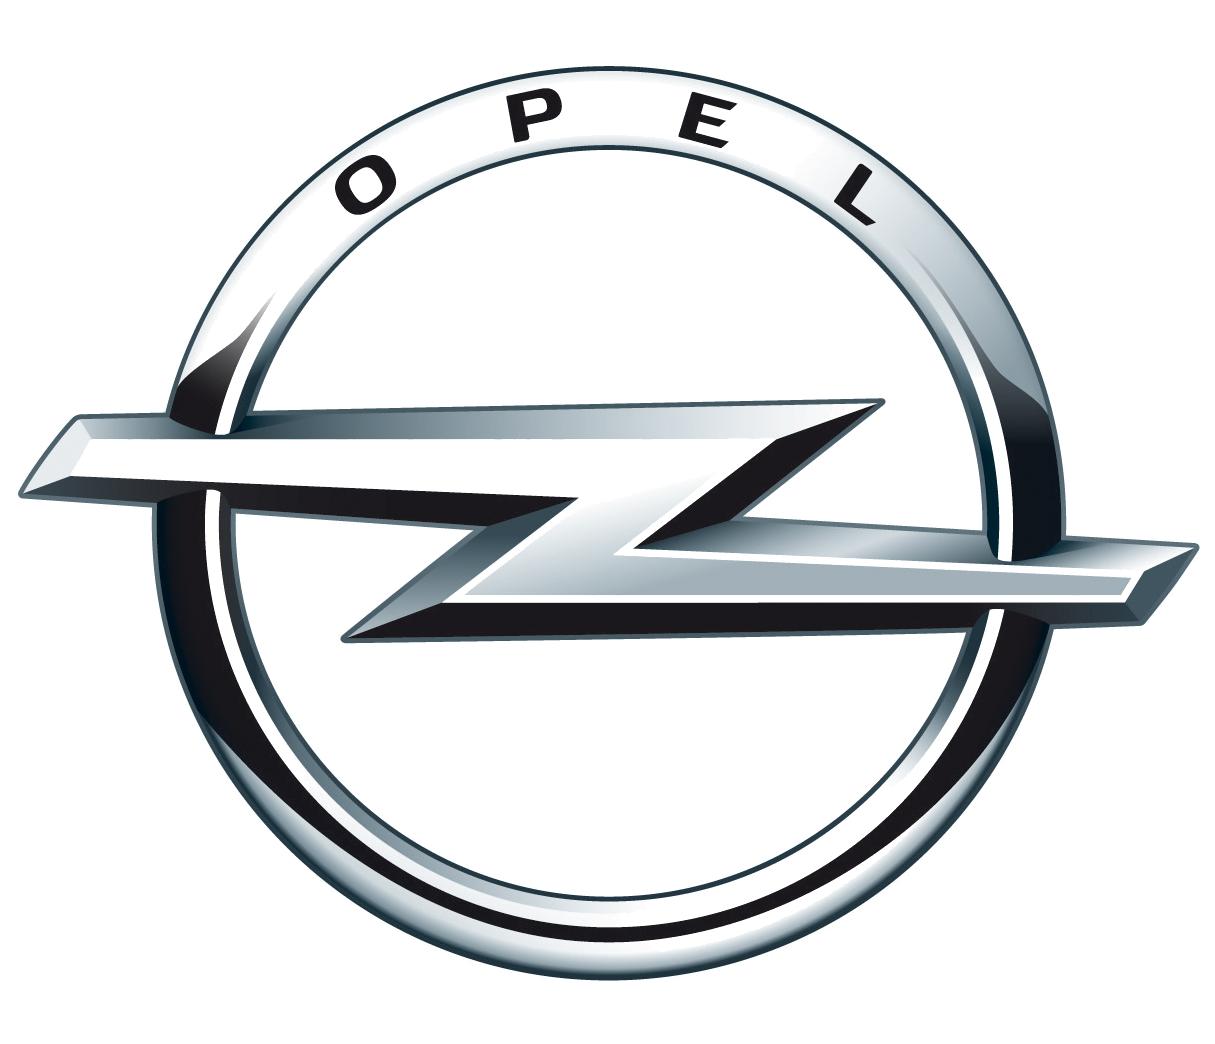 car_logo_PNG1659.png